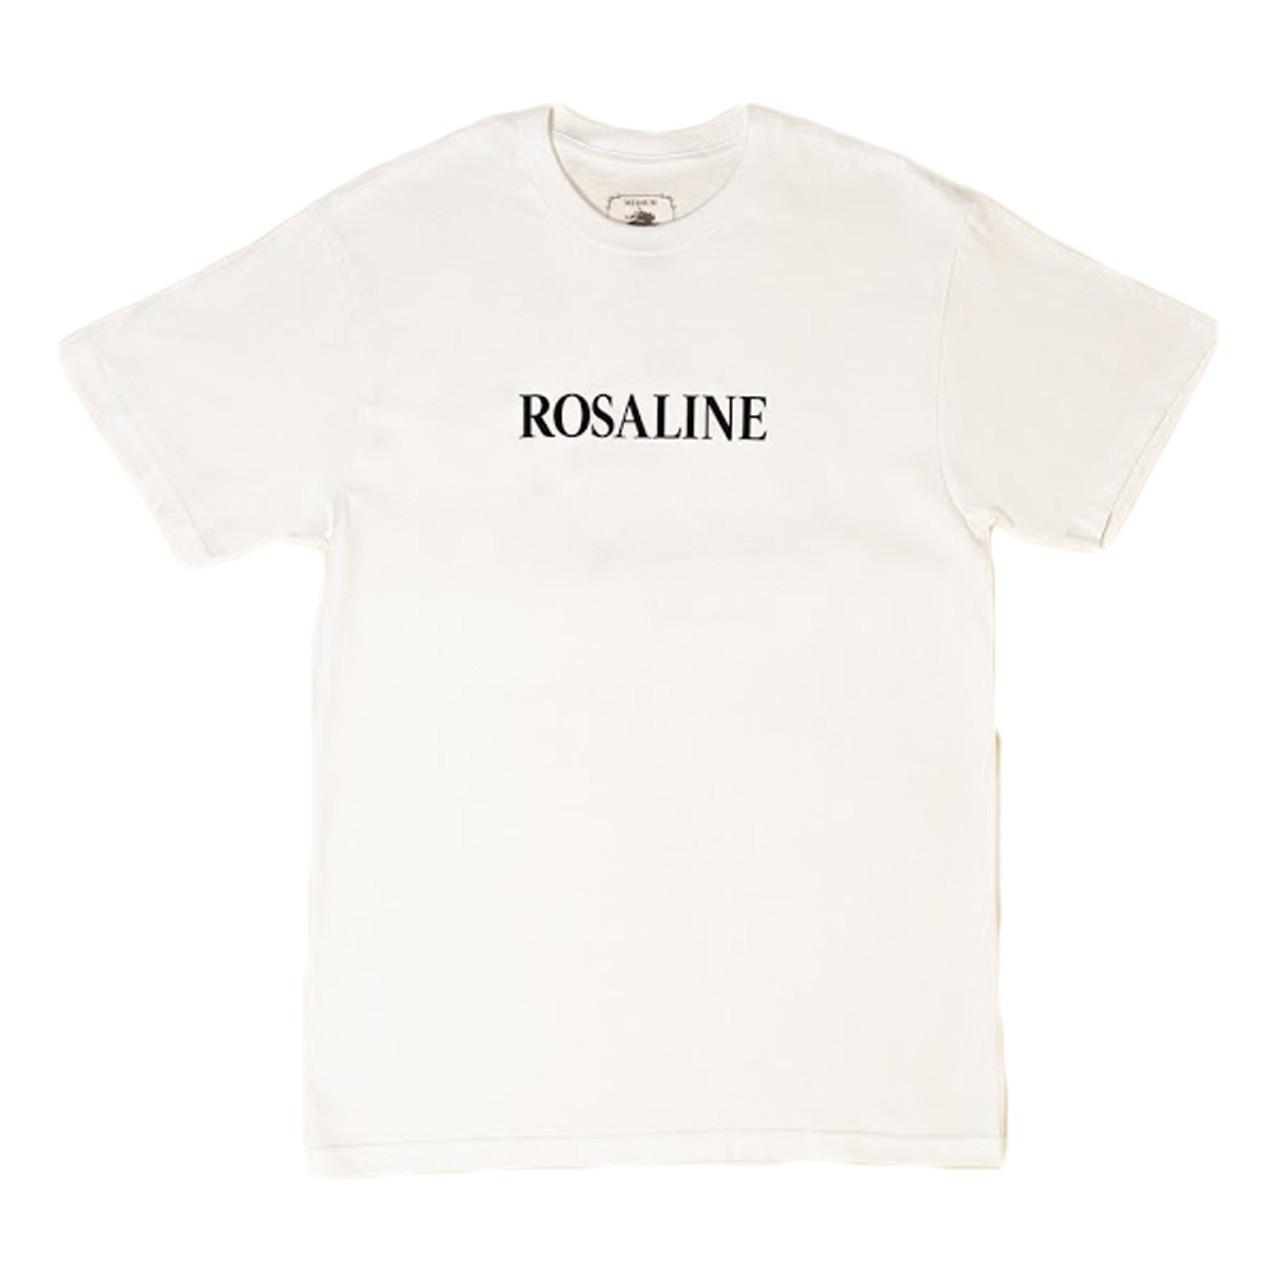 ROSALINE Reformation Tee White